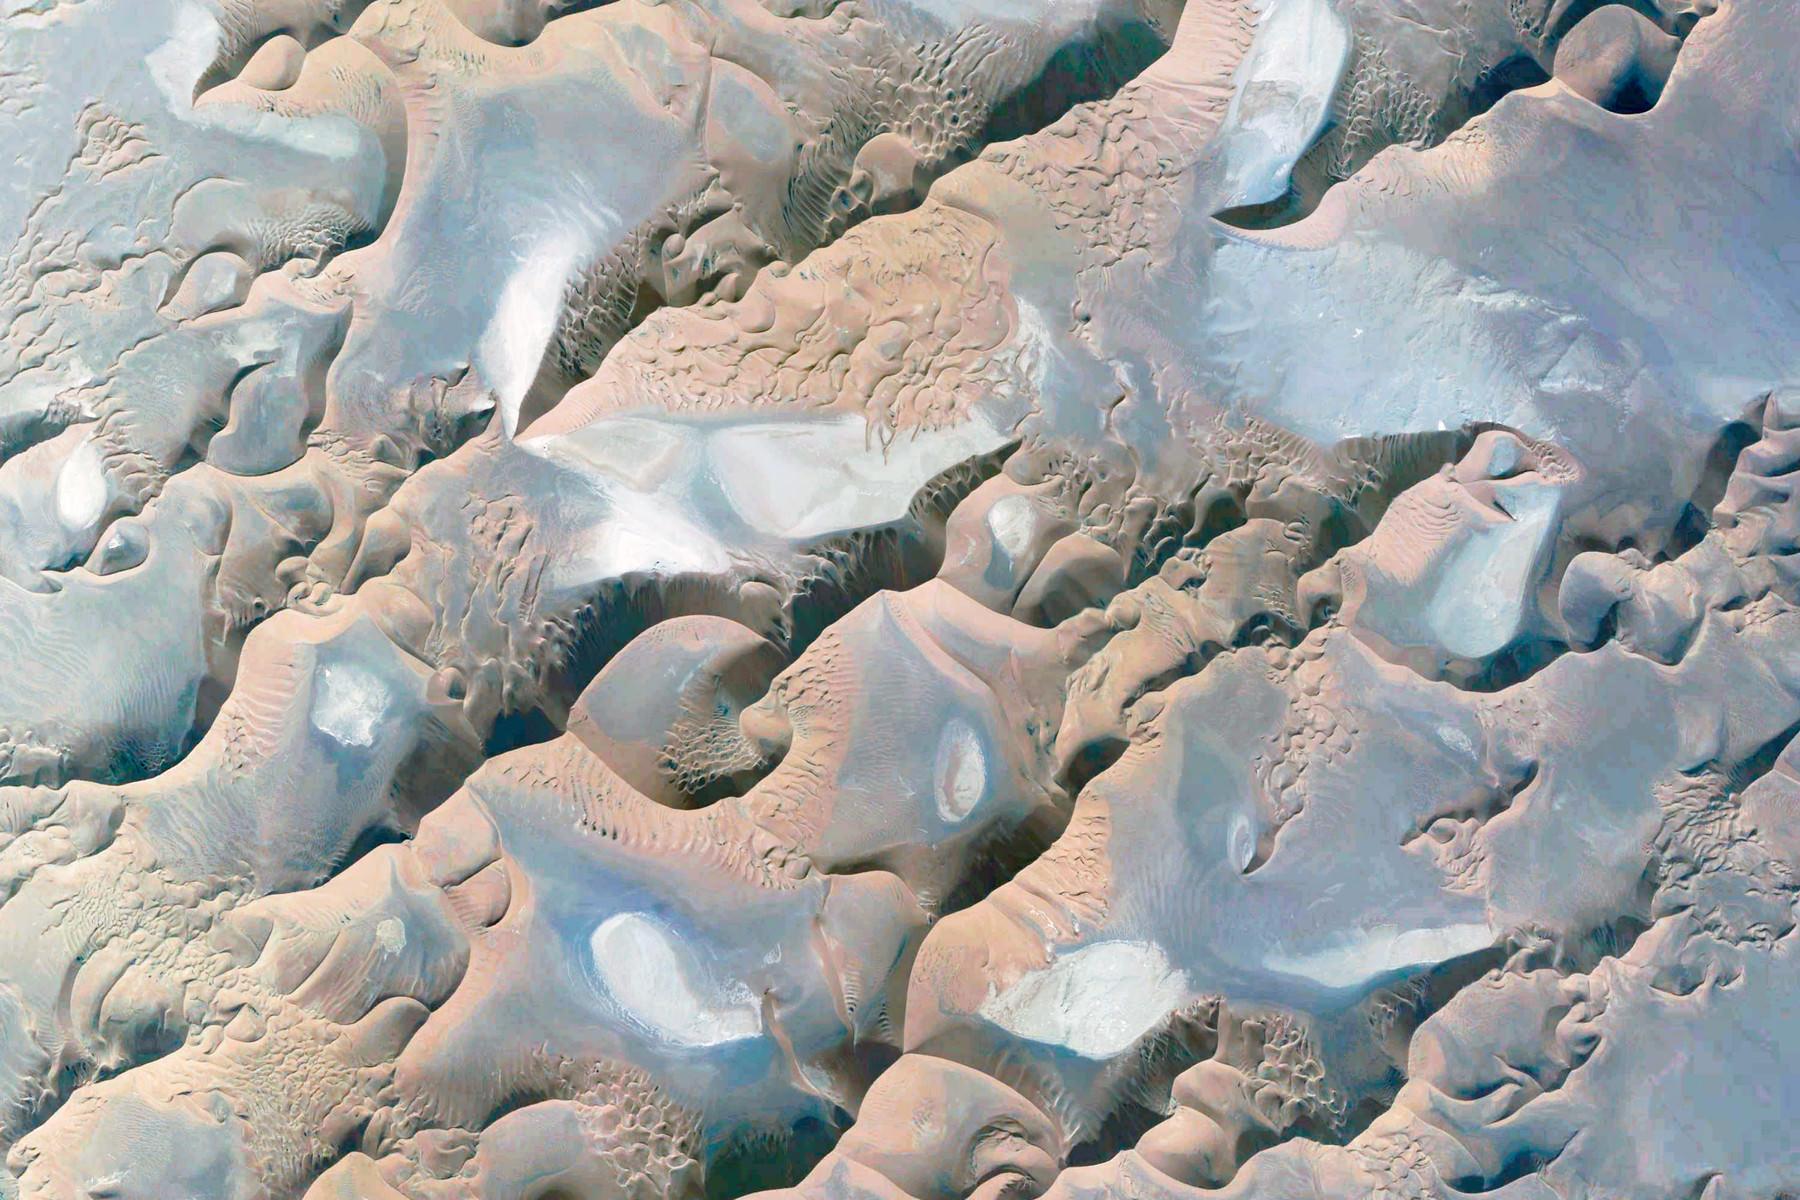 google-earth-Iran-Kerman-2157